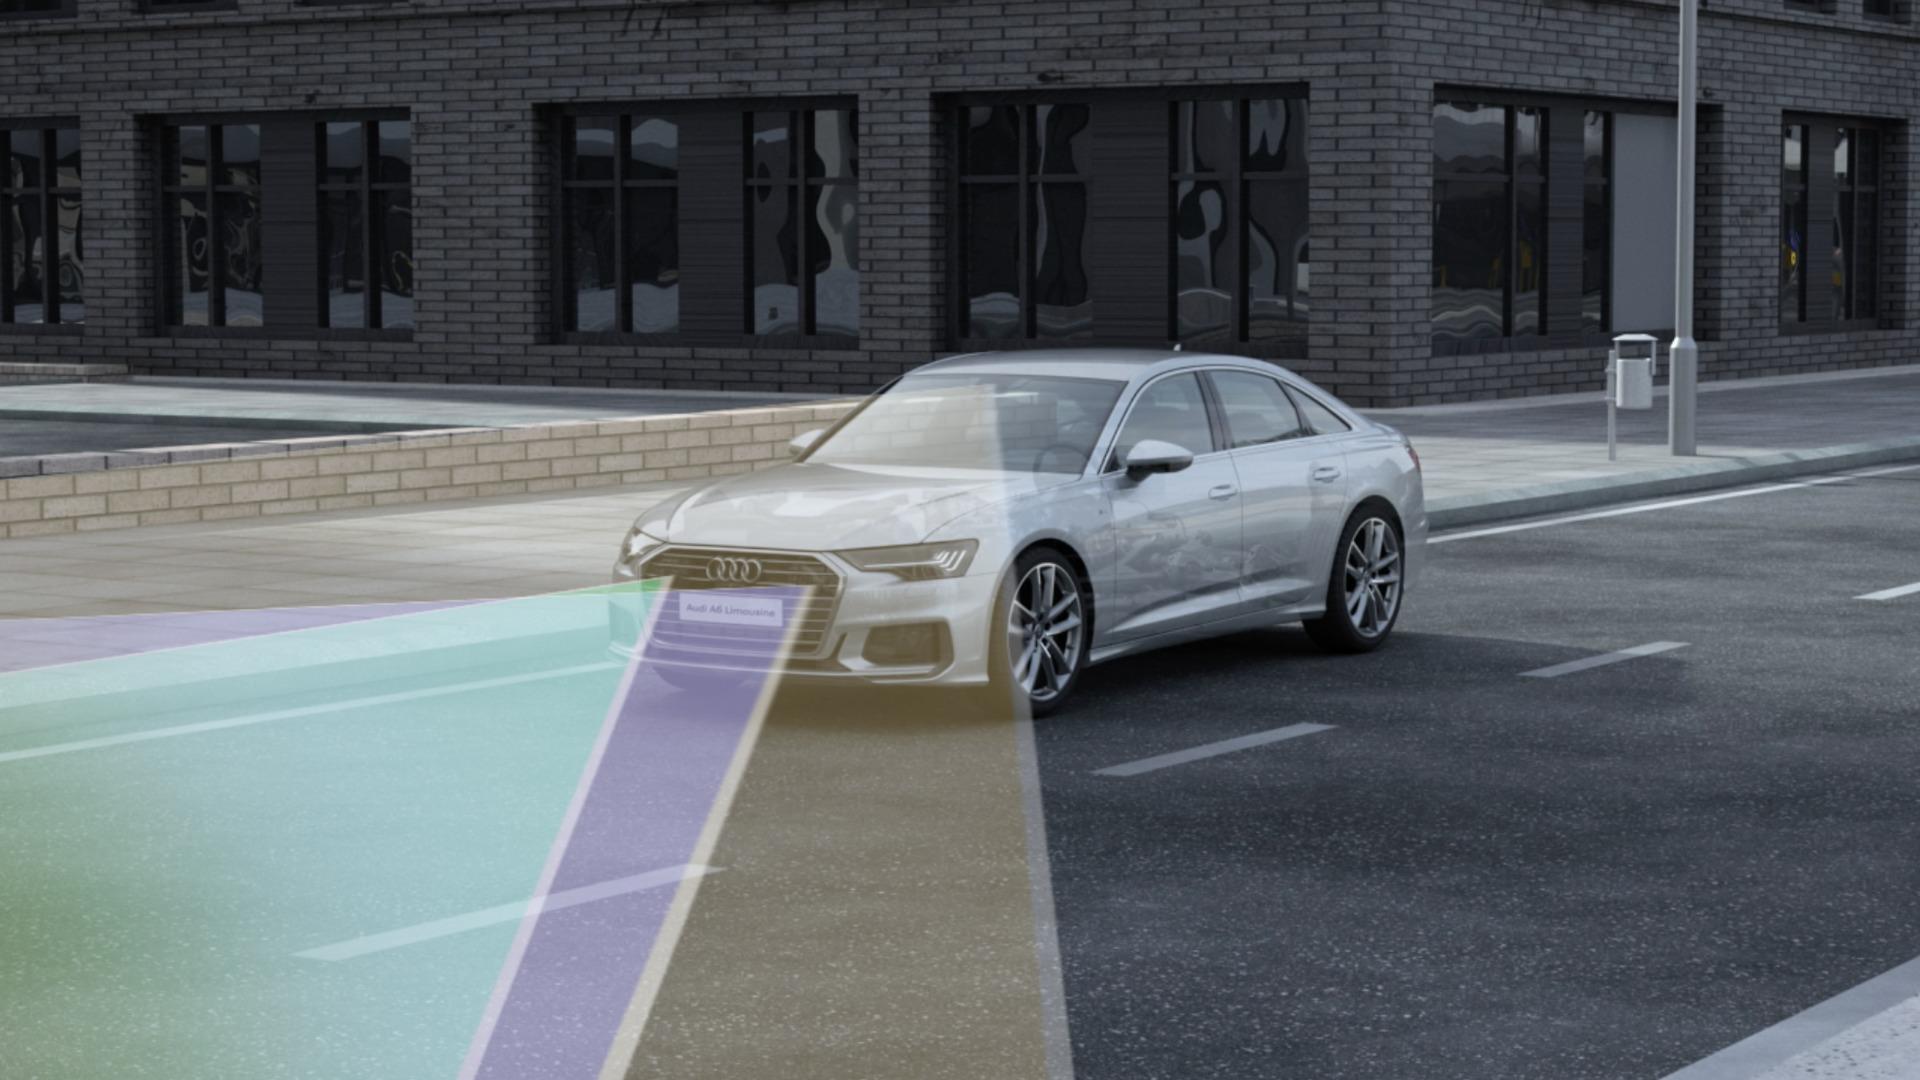 Animation Audi A6 48V mild hybrid system